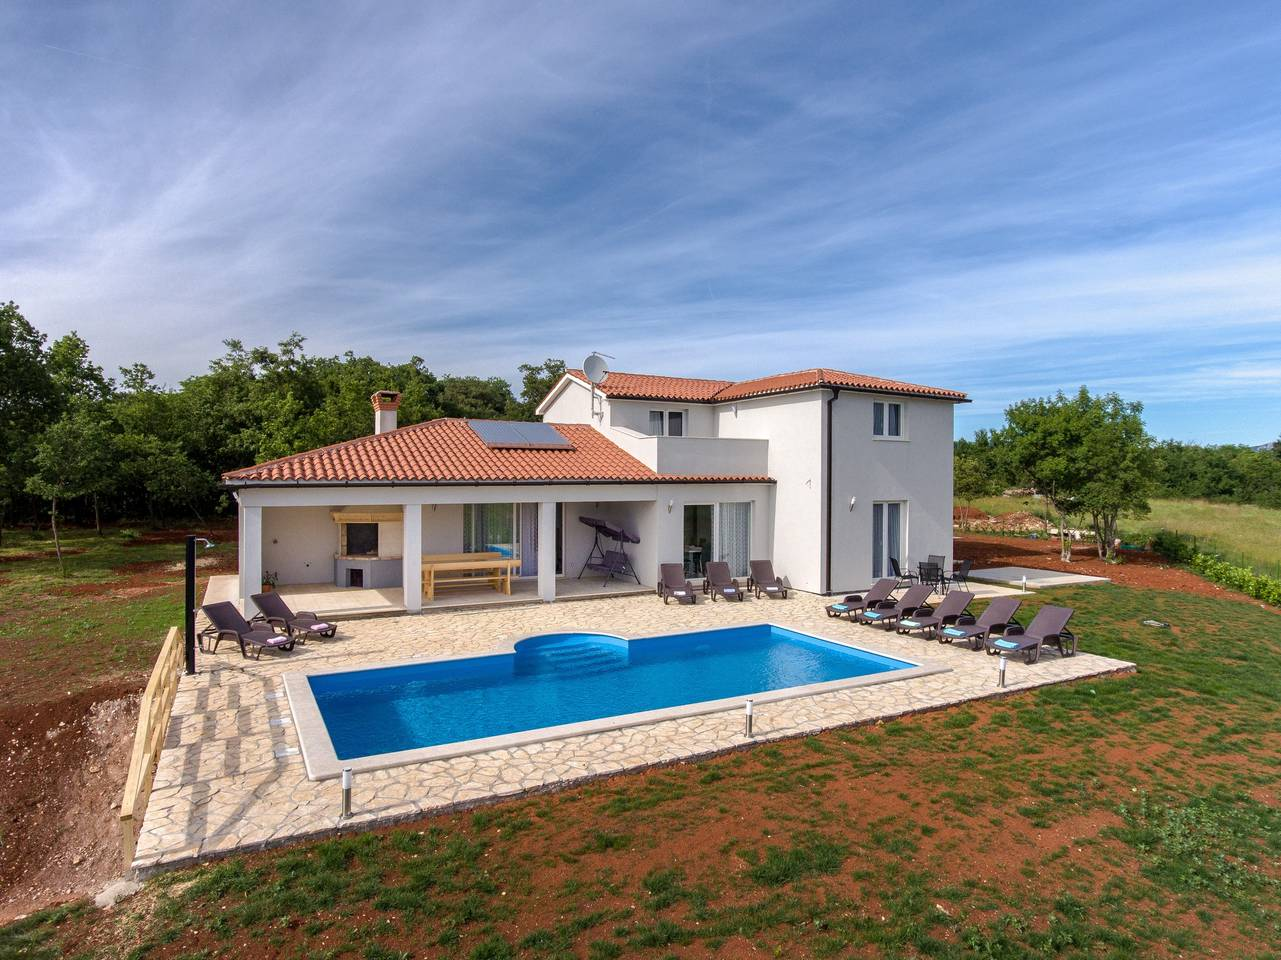 Apartment Private Villa in Sumber near Rabac photo 16812629